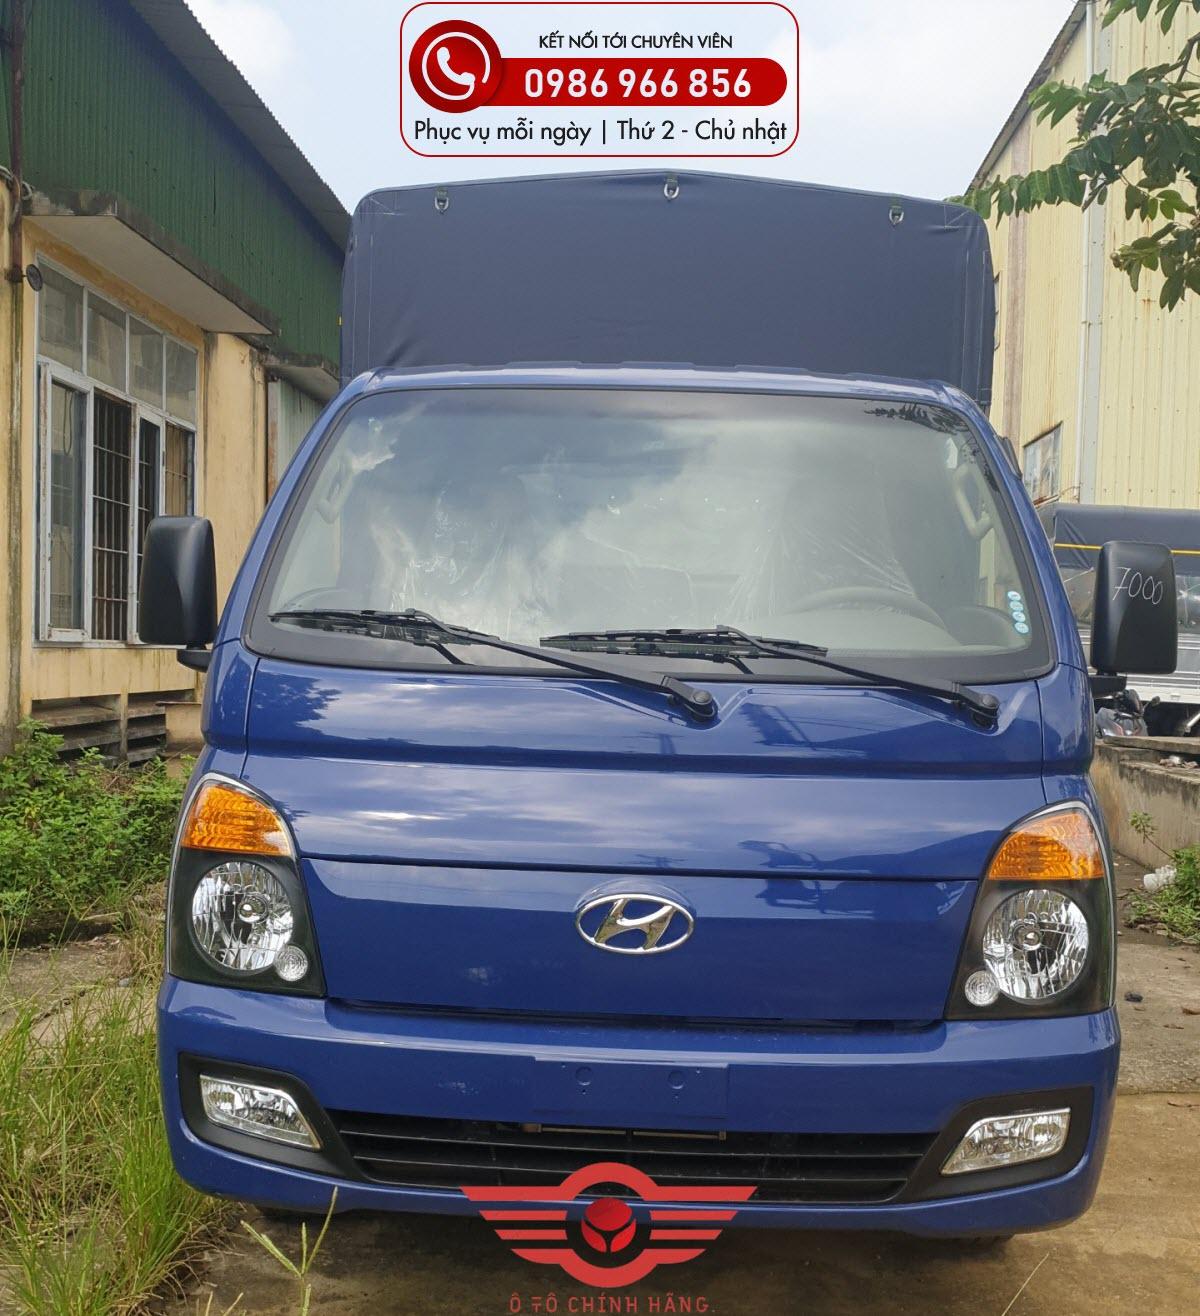 Xe tải Hyundai H150 chở gia cầm gà vịt